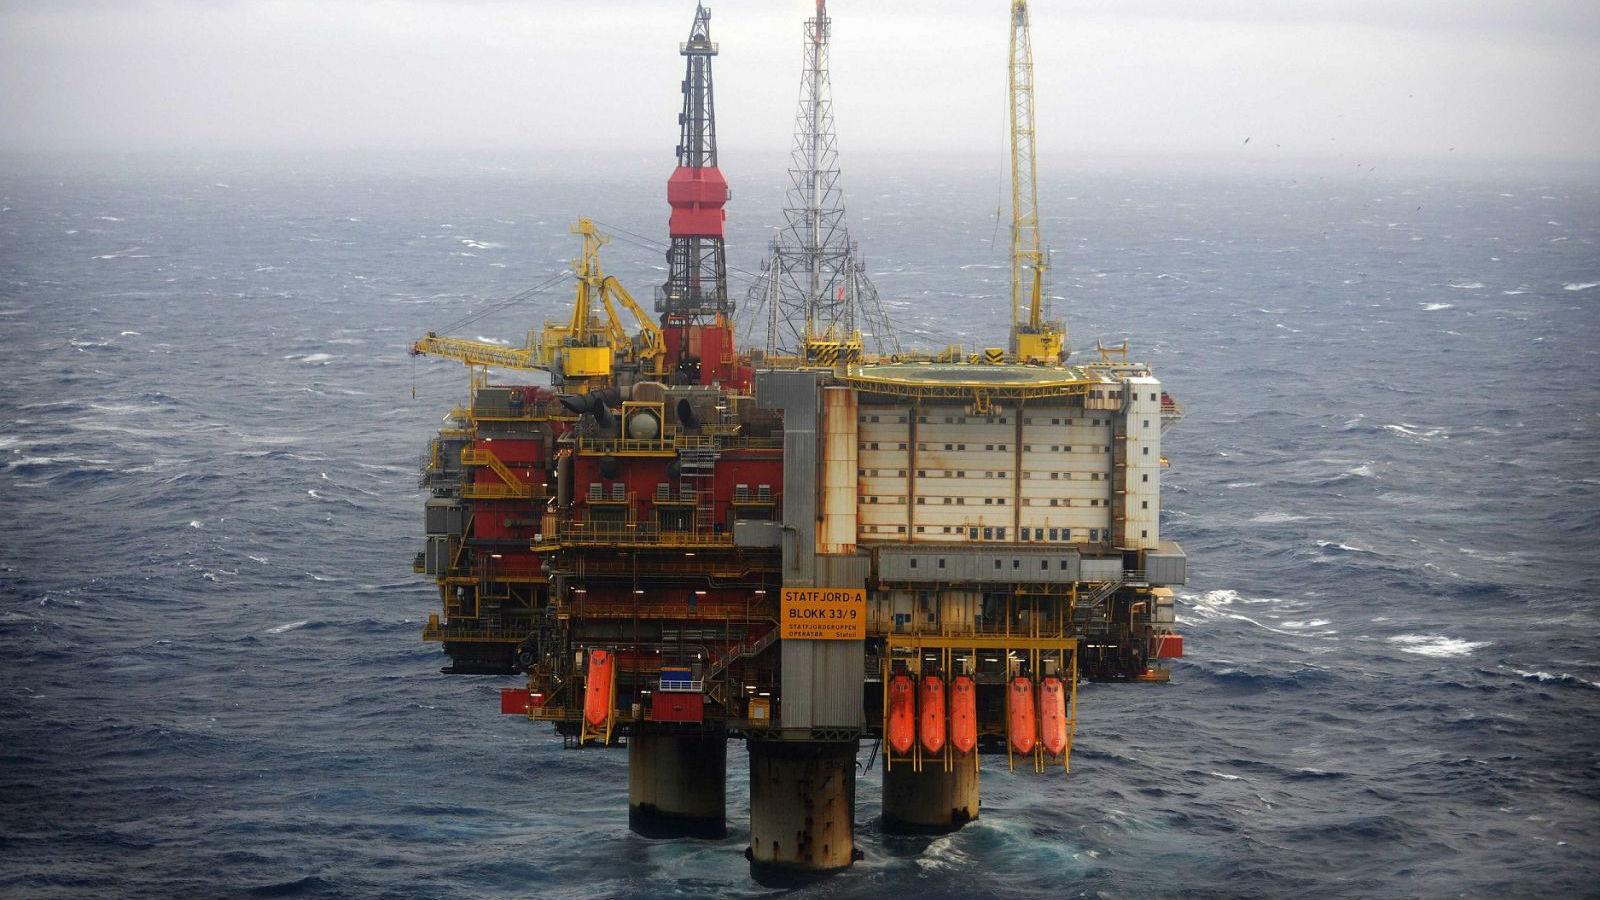 Нефтяная платформа Statfjord